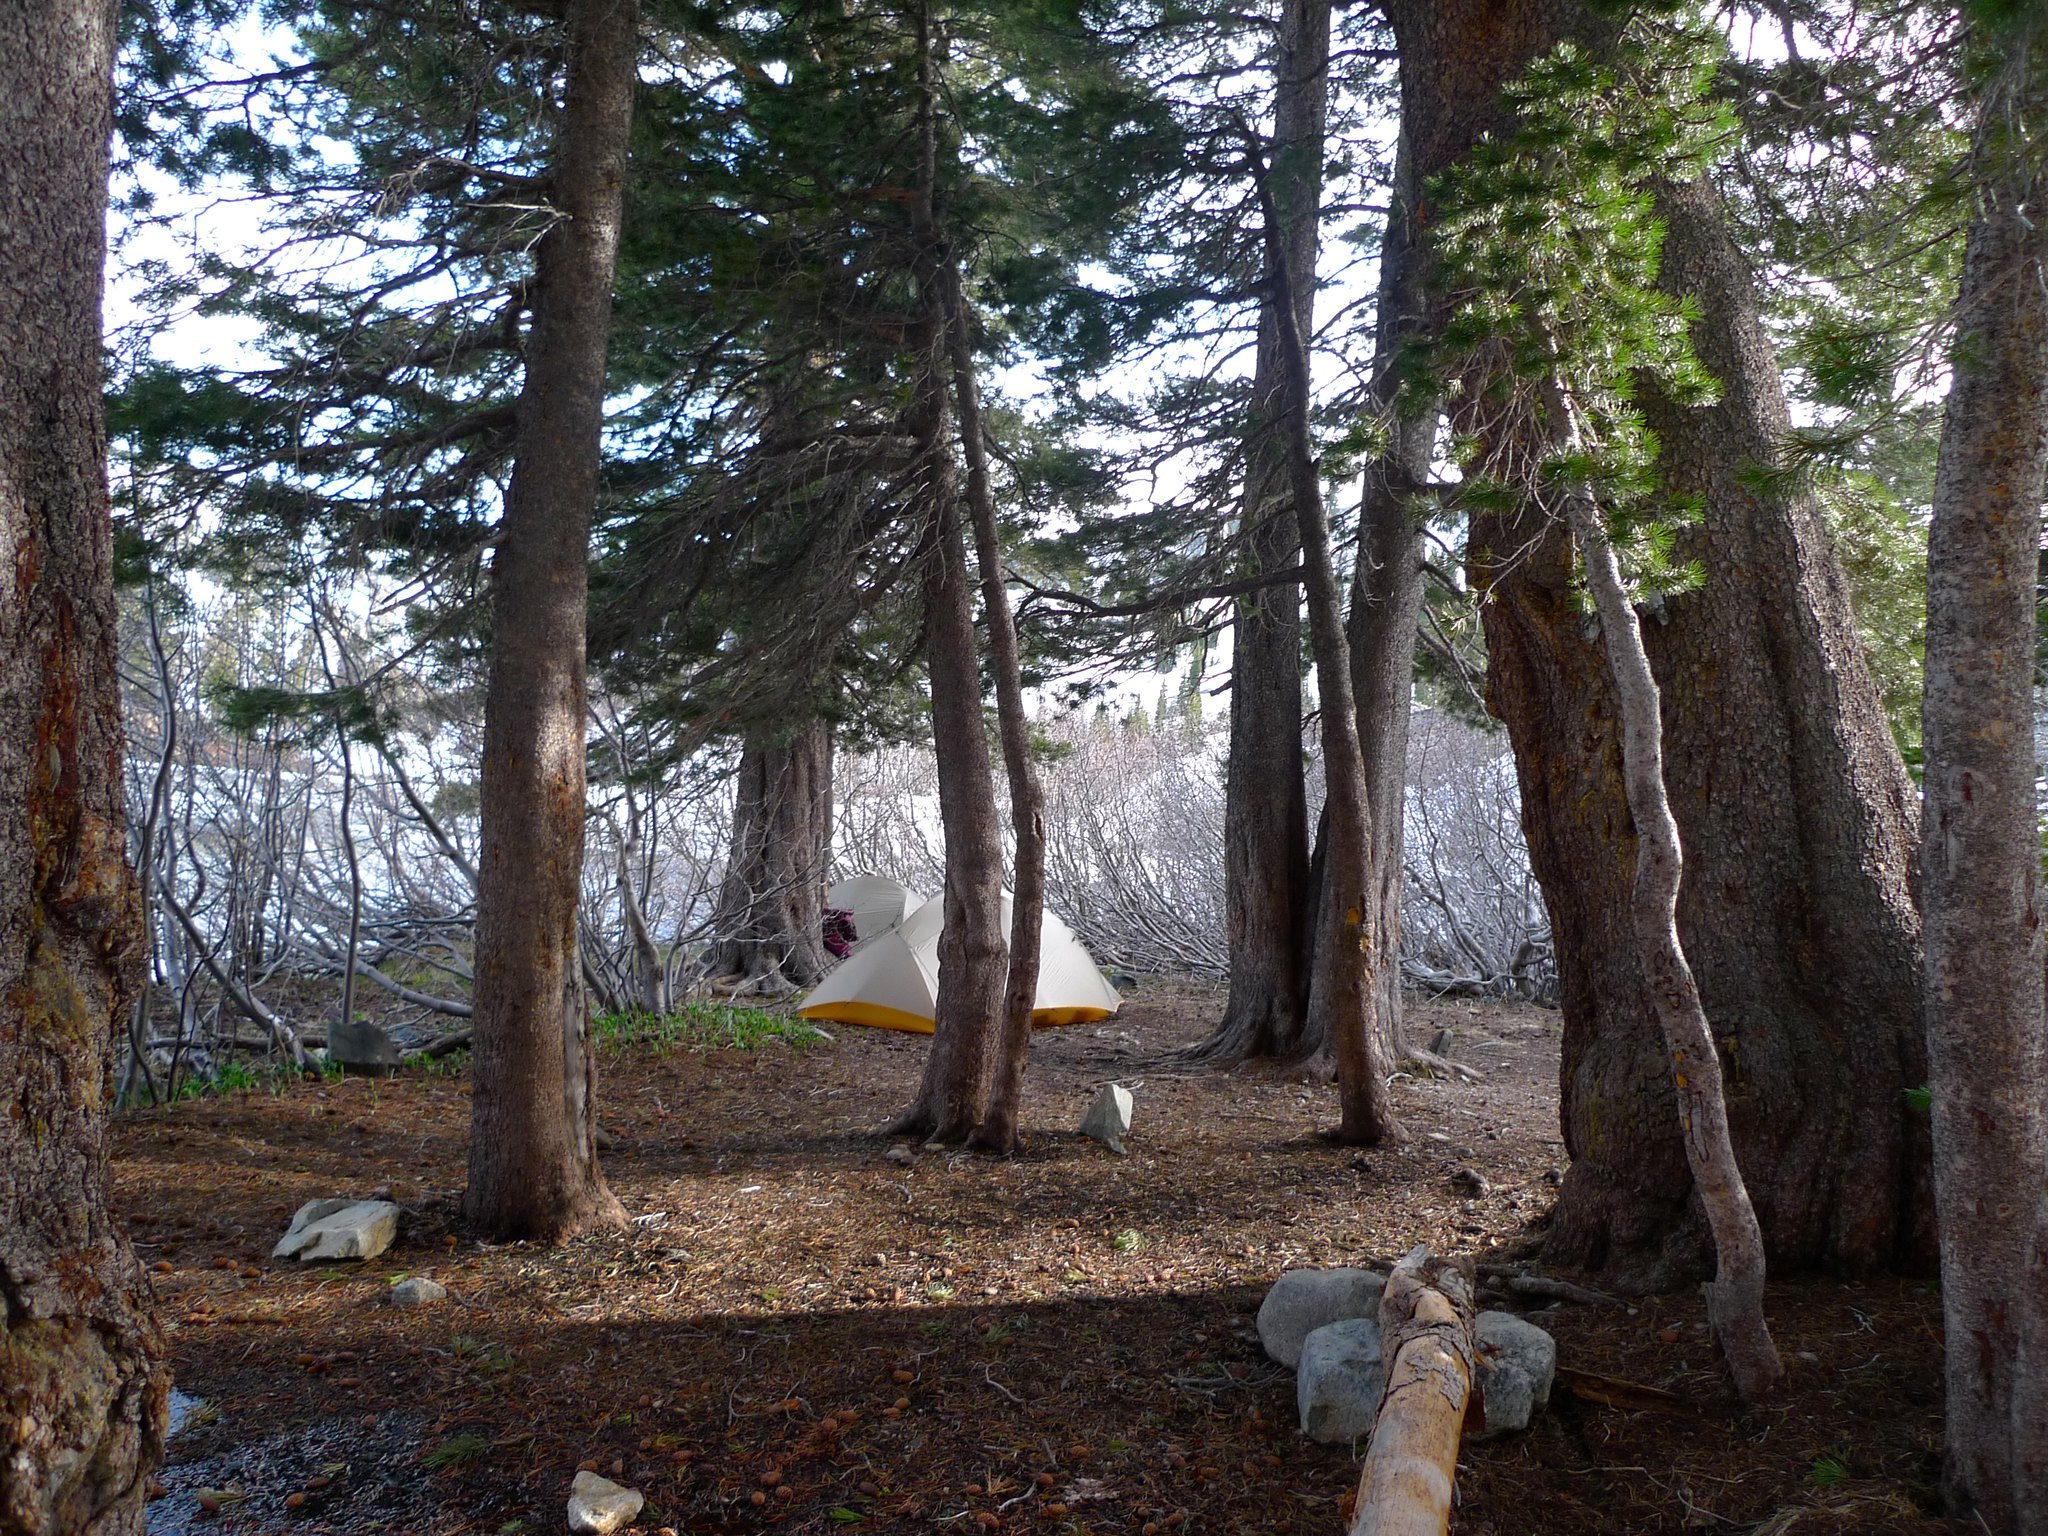 Camp 1 at Heather Lake